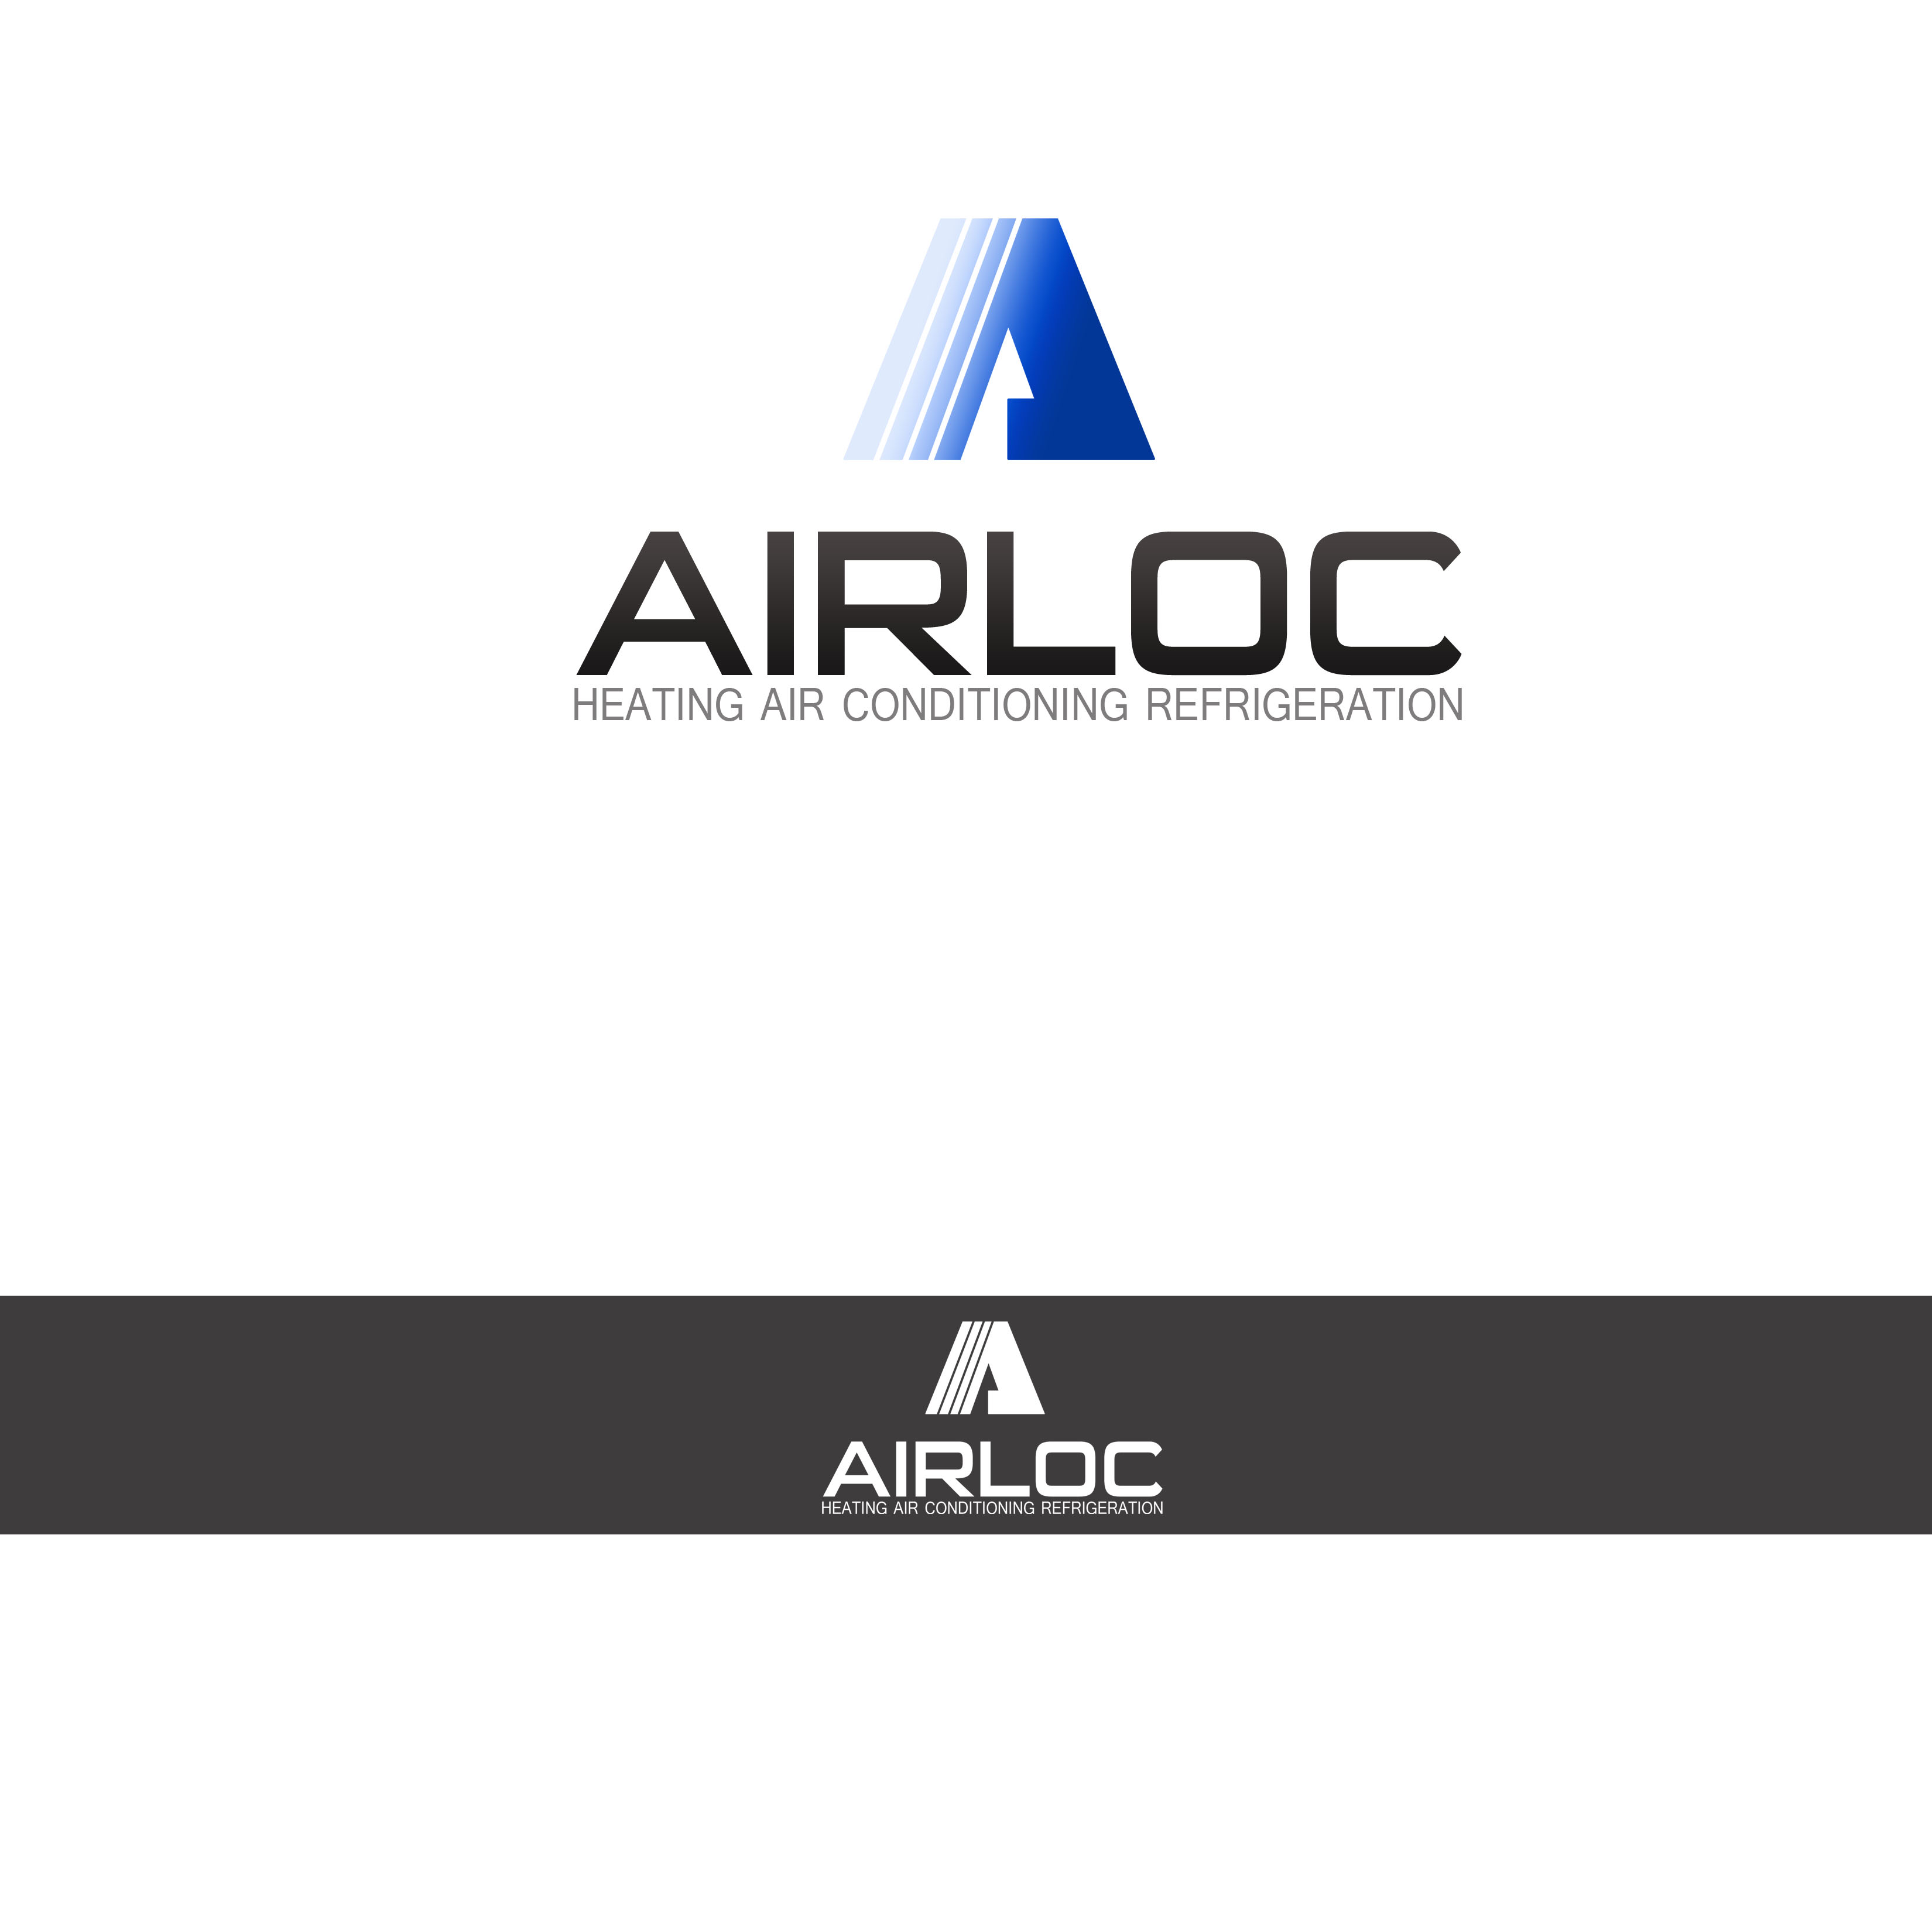 Logo Design by Allan Esclamado - Entry No. 67 in the Logo Design Contest Airloc Logo Design.